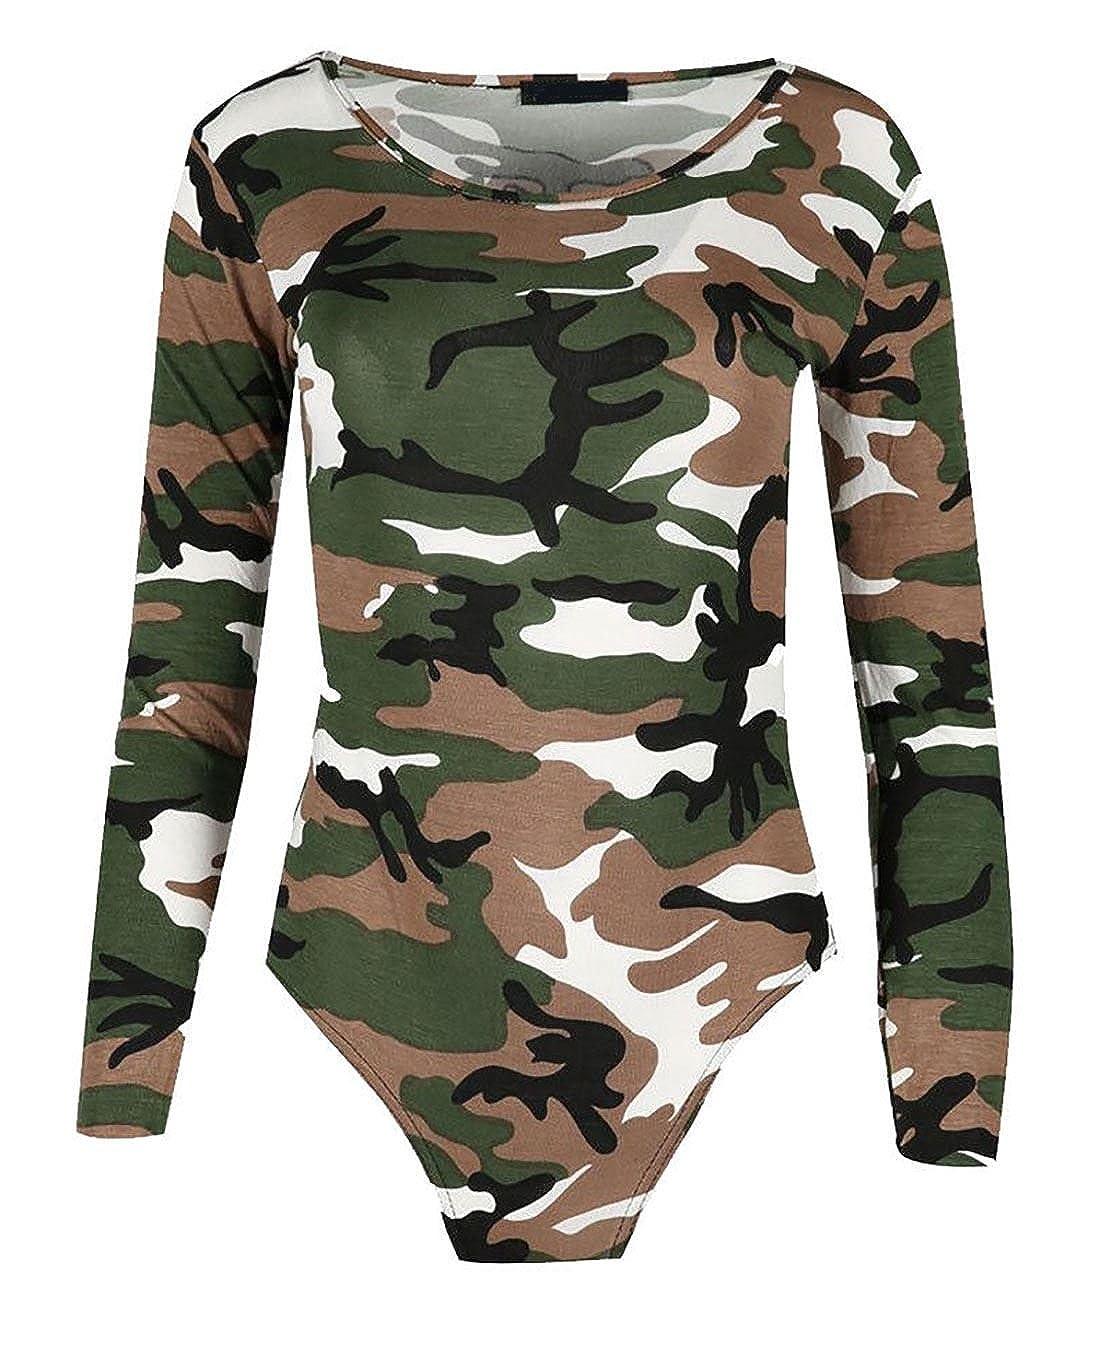 Islander Fashions Frauen Animal Print Langarm Scoop Neck Bodysuit Damen Stretchy Trikot Top S/M, M/L